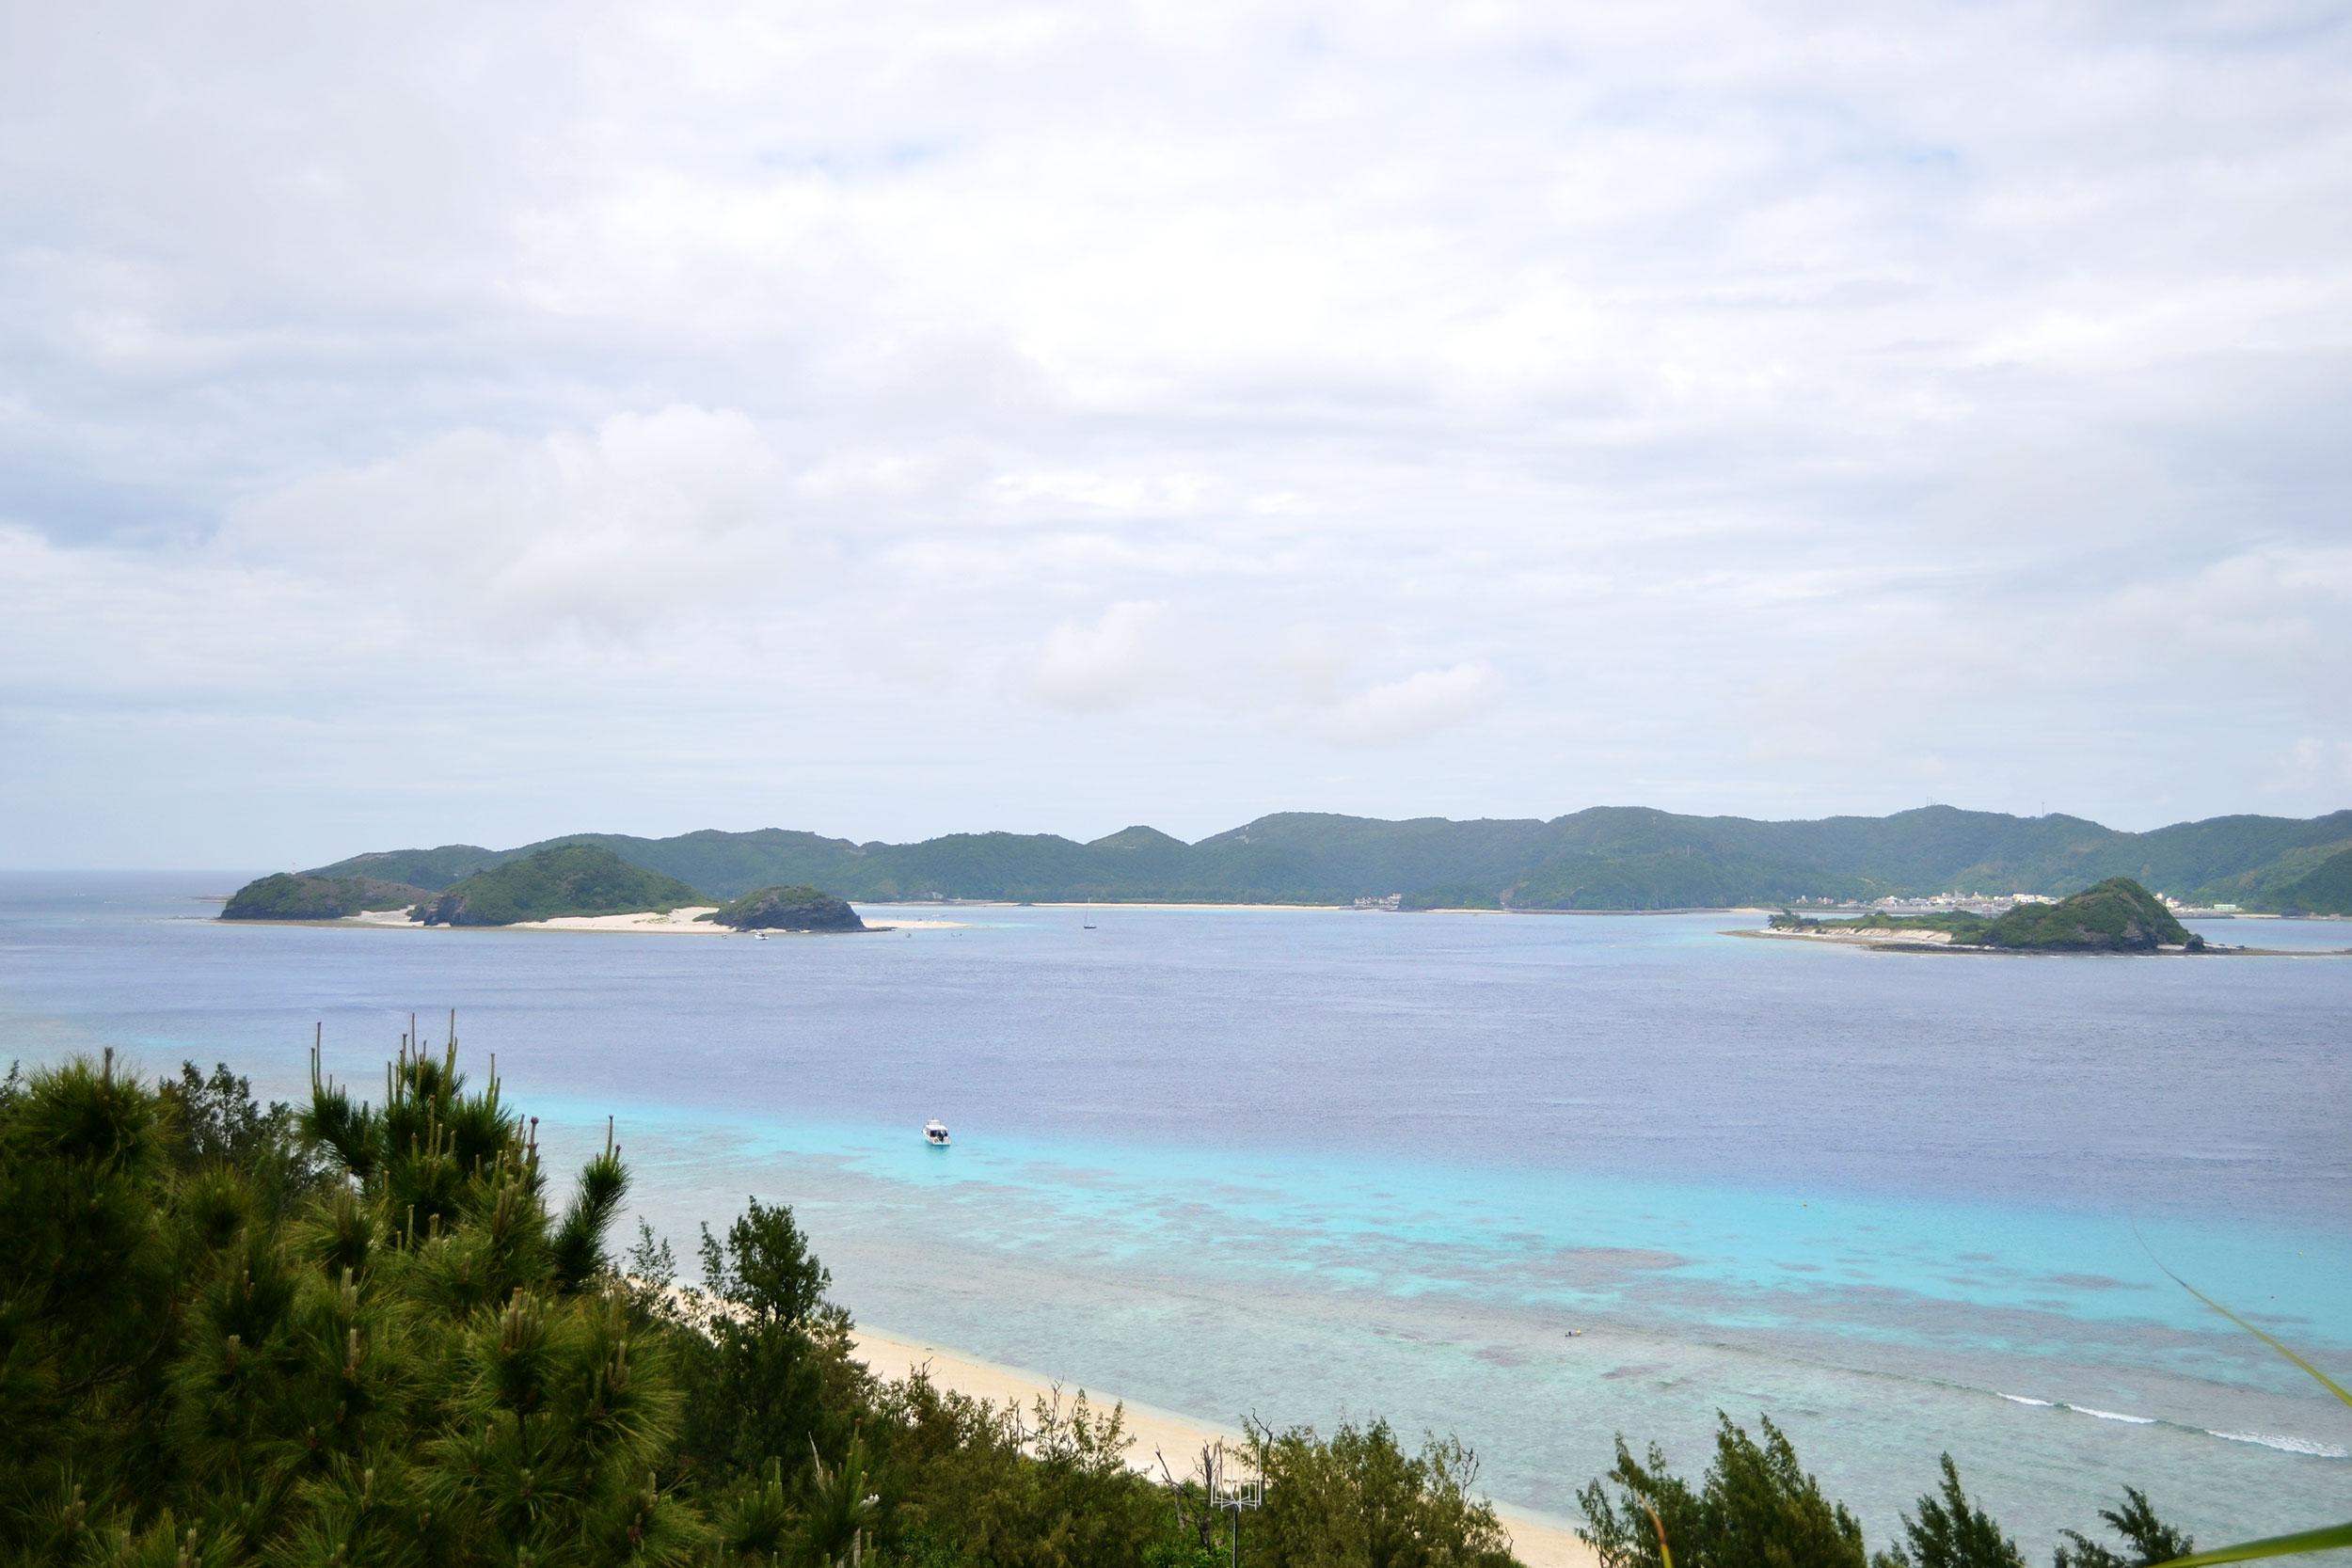 Aka island, Okinawa